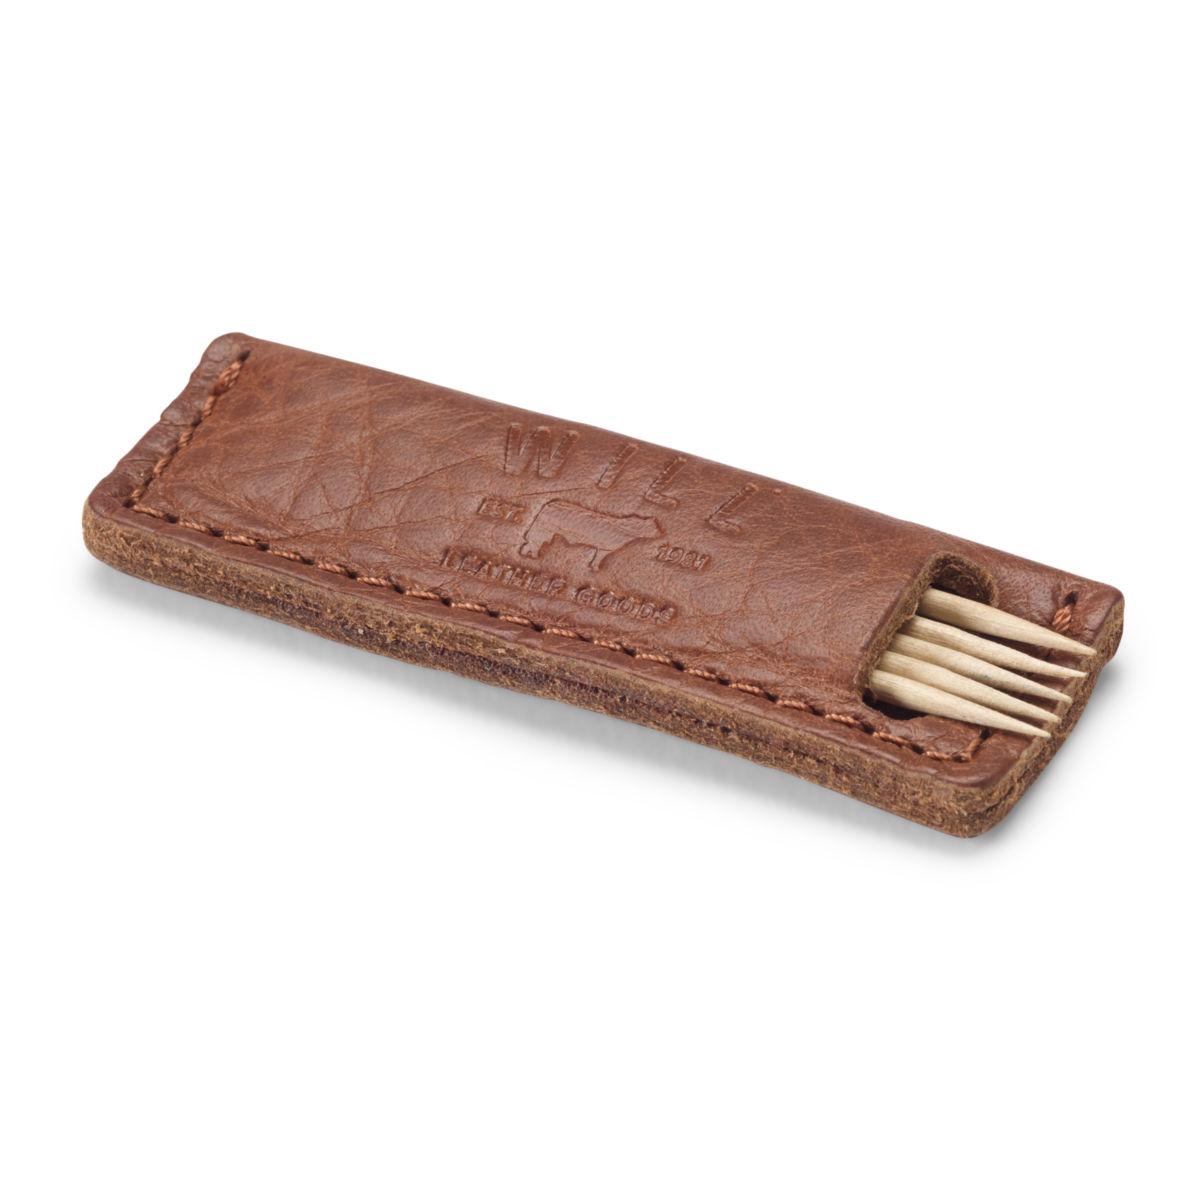 Leather Toothpick Holder - image number 0